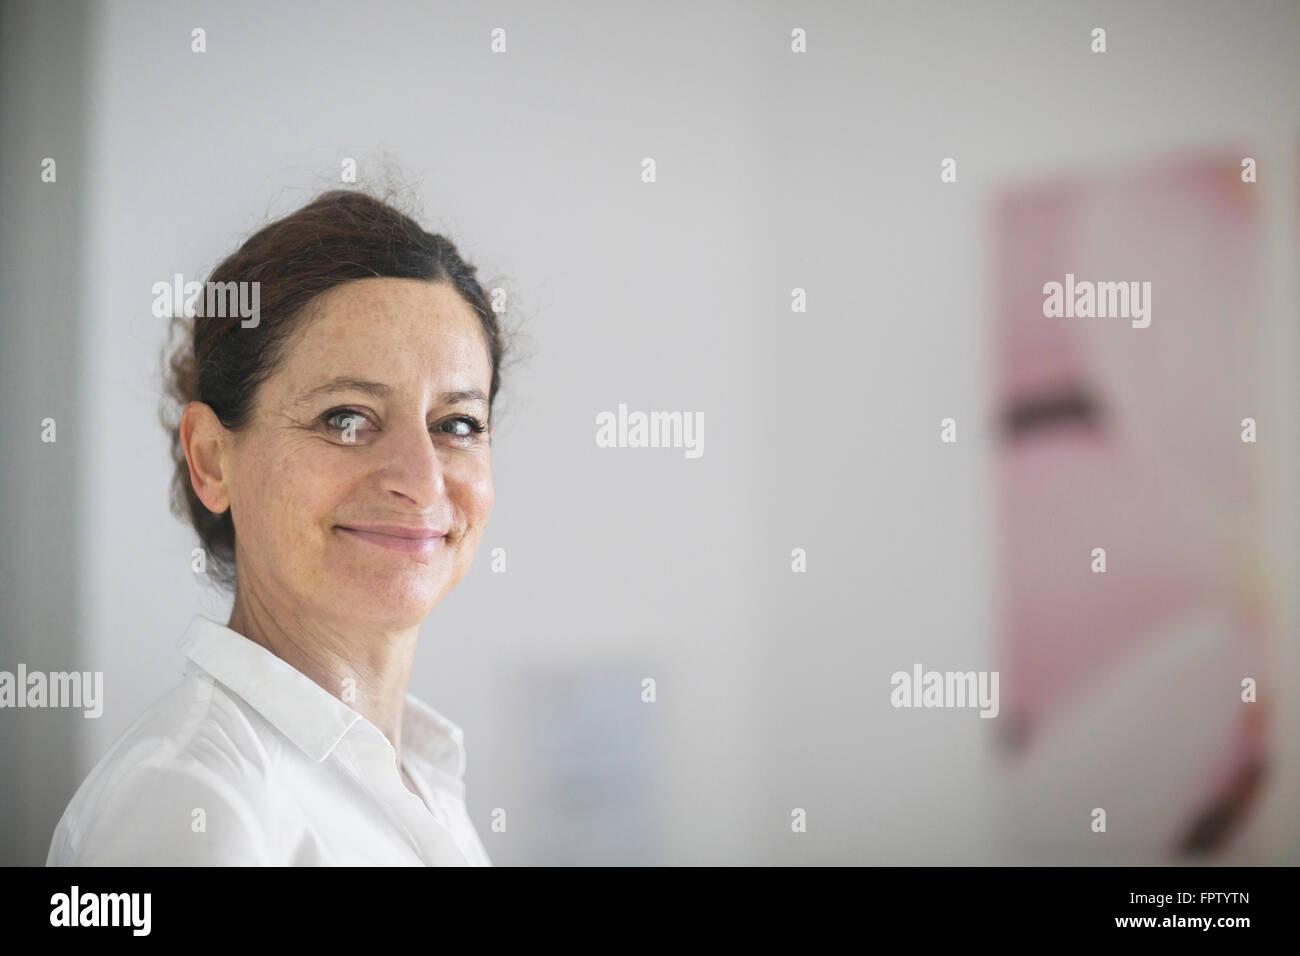 Portrait of a female doctor smiling, Freiburg Im Breisgau, Baden-Württemberg, Germany - Stock Image